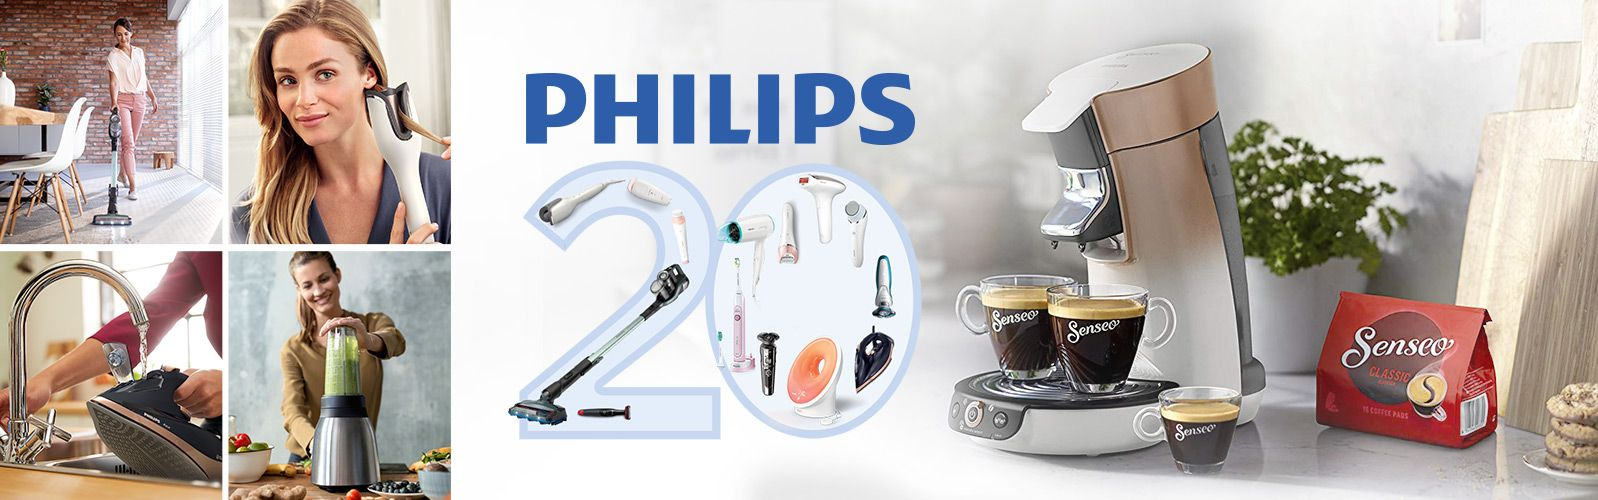 20 Jahre PHILIPS Technik bei QVC